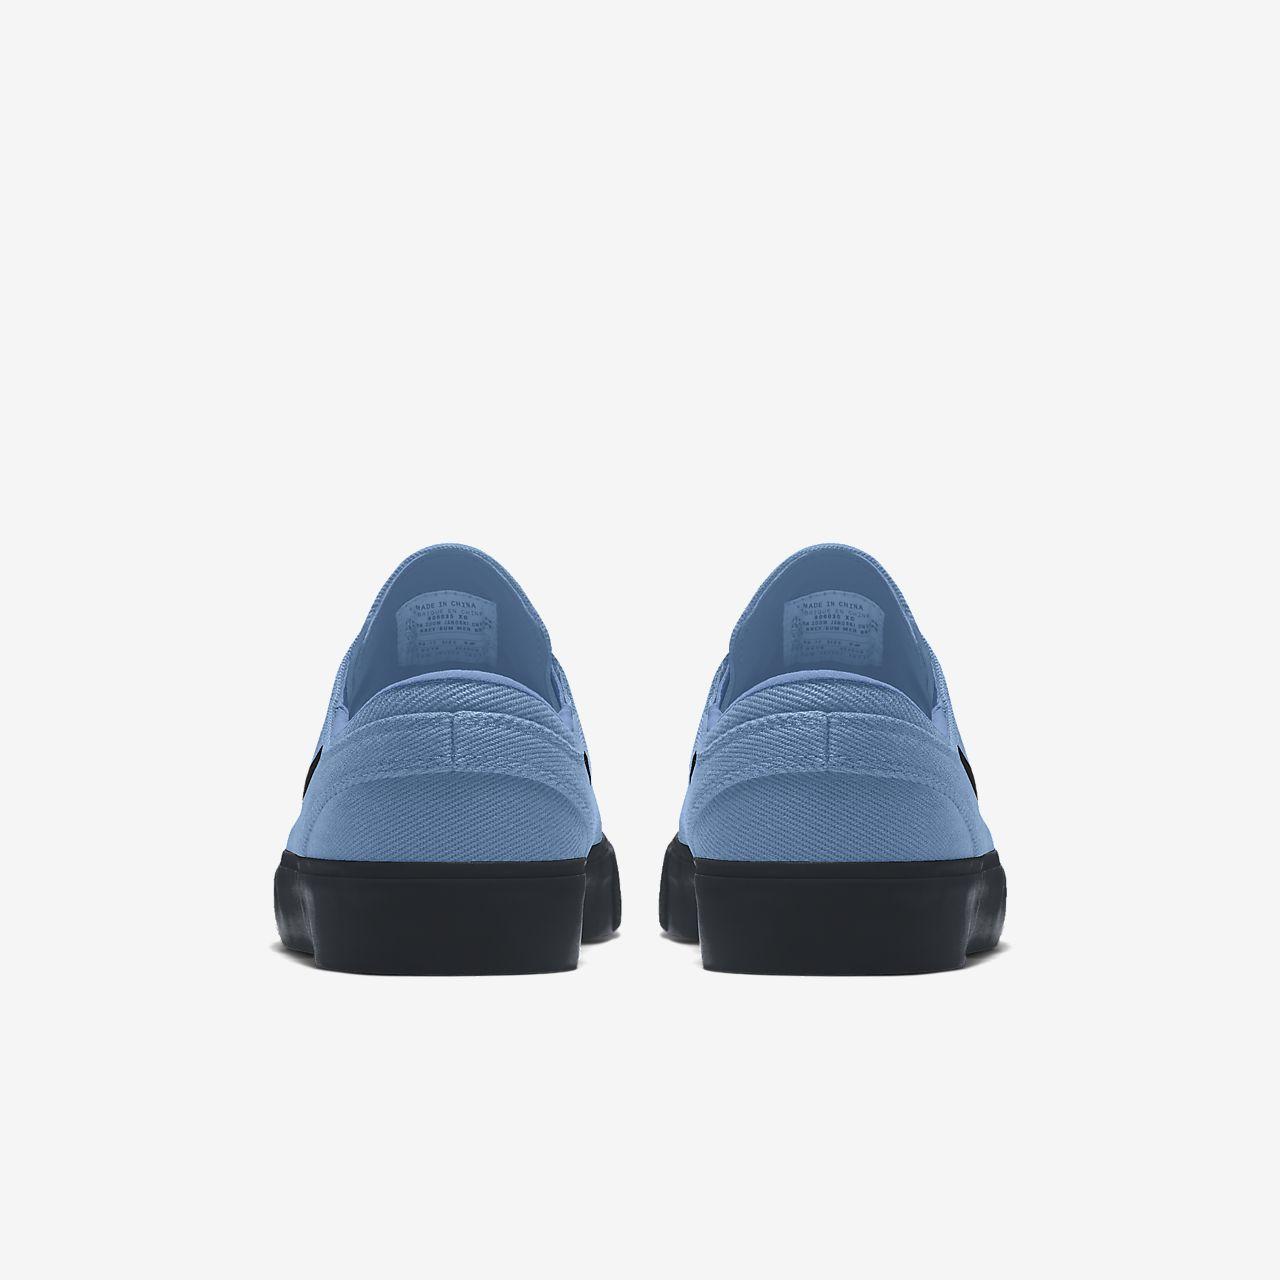 Nike SB Zoom Stefan Janoski RM By You personalisierbarer Skateboardschuh